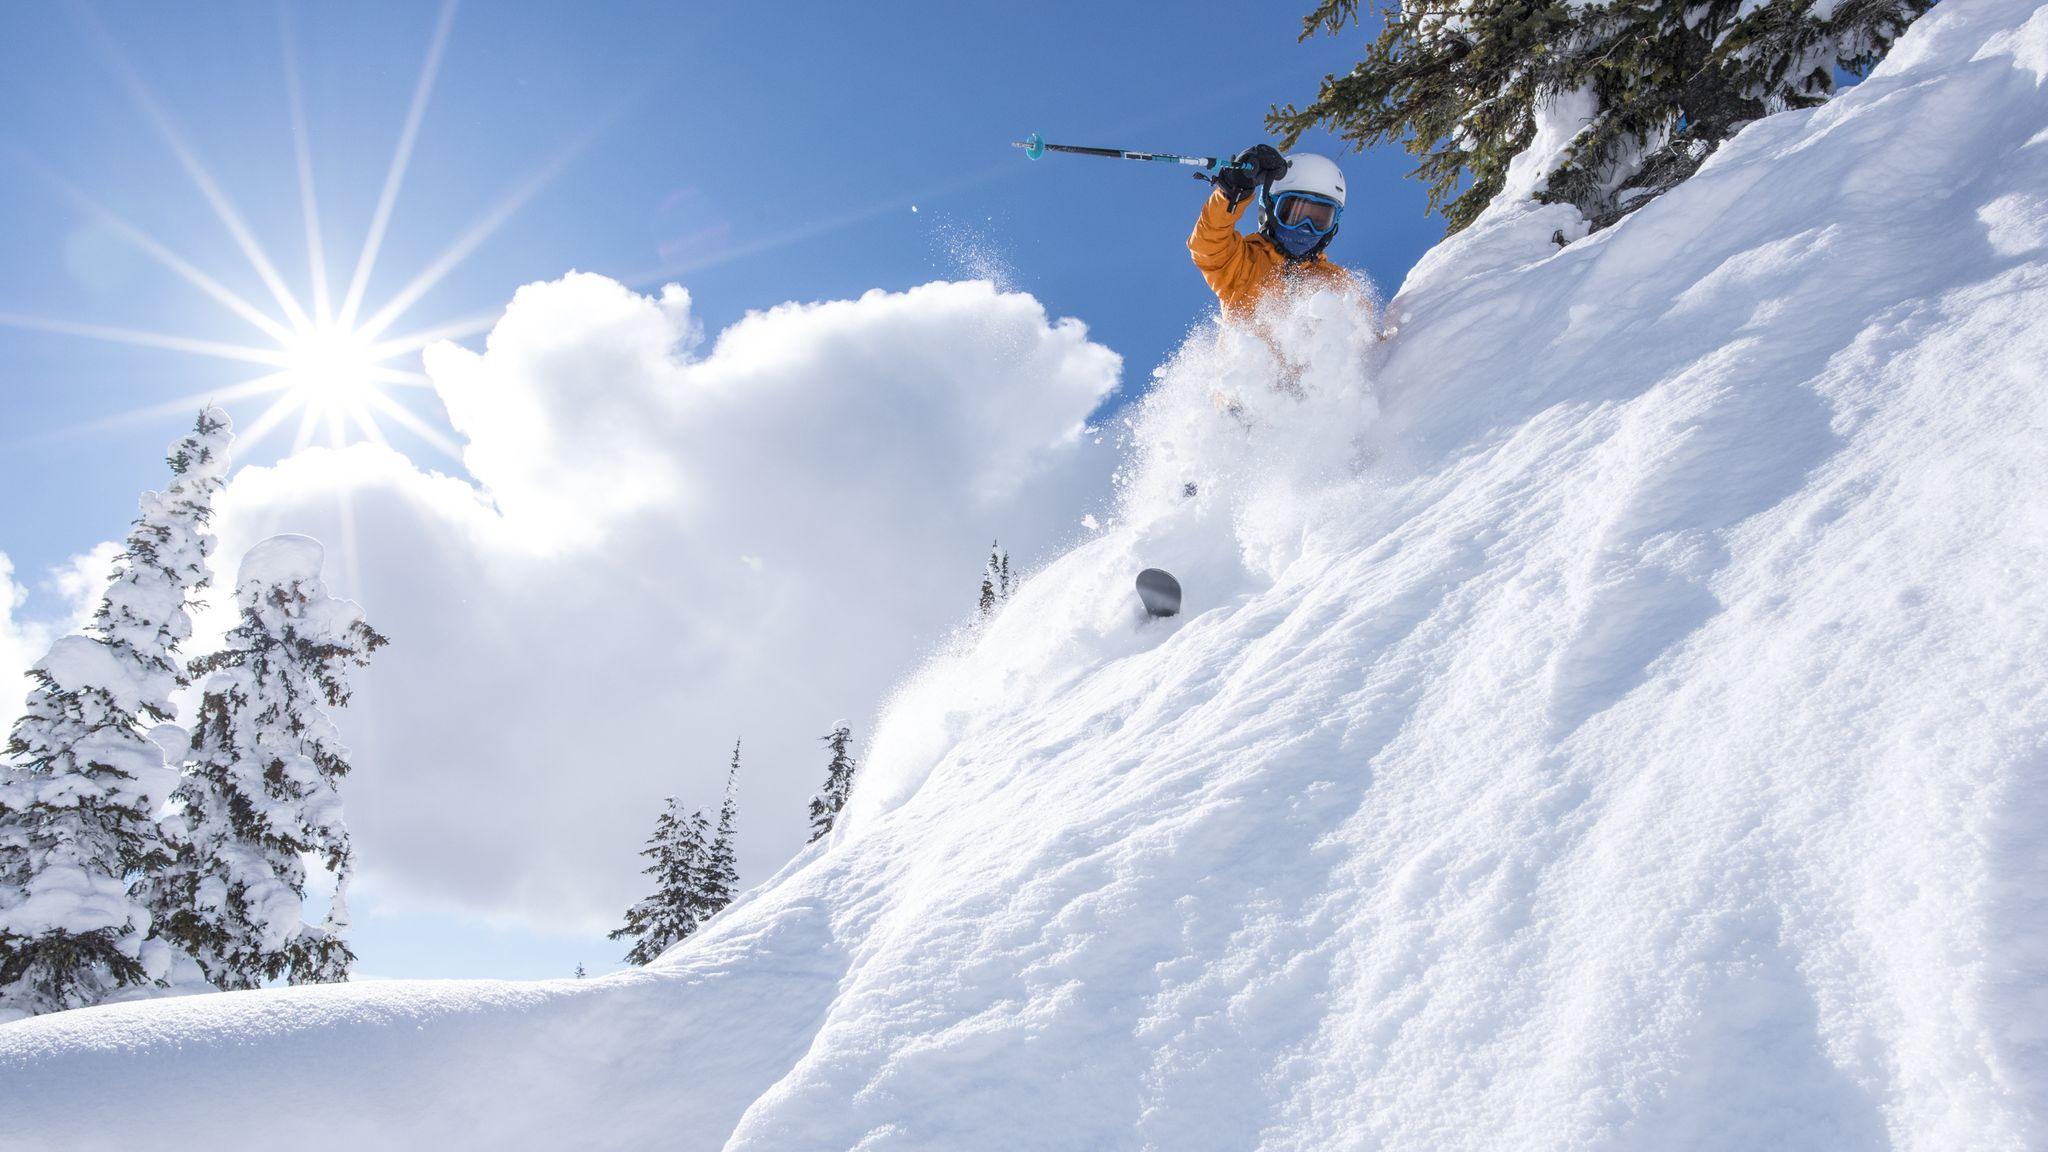 Finally, a Family Ski Trip Where Everyone Has Fun